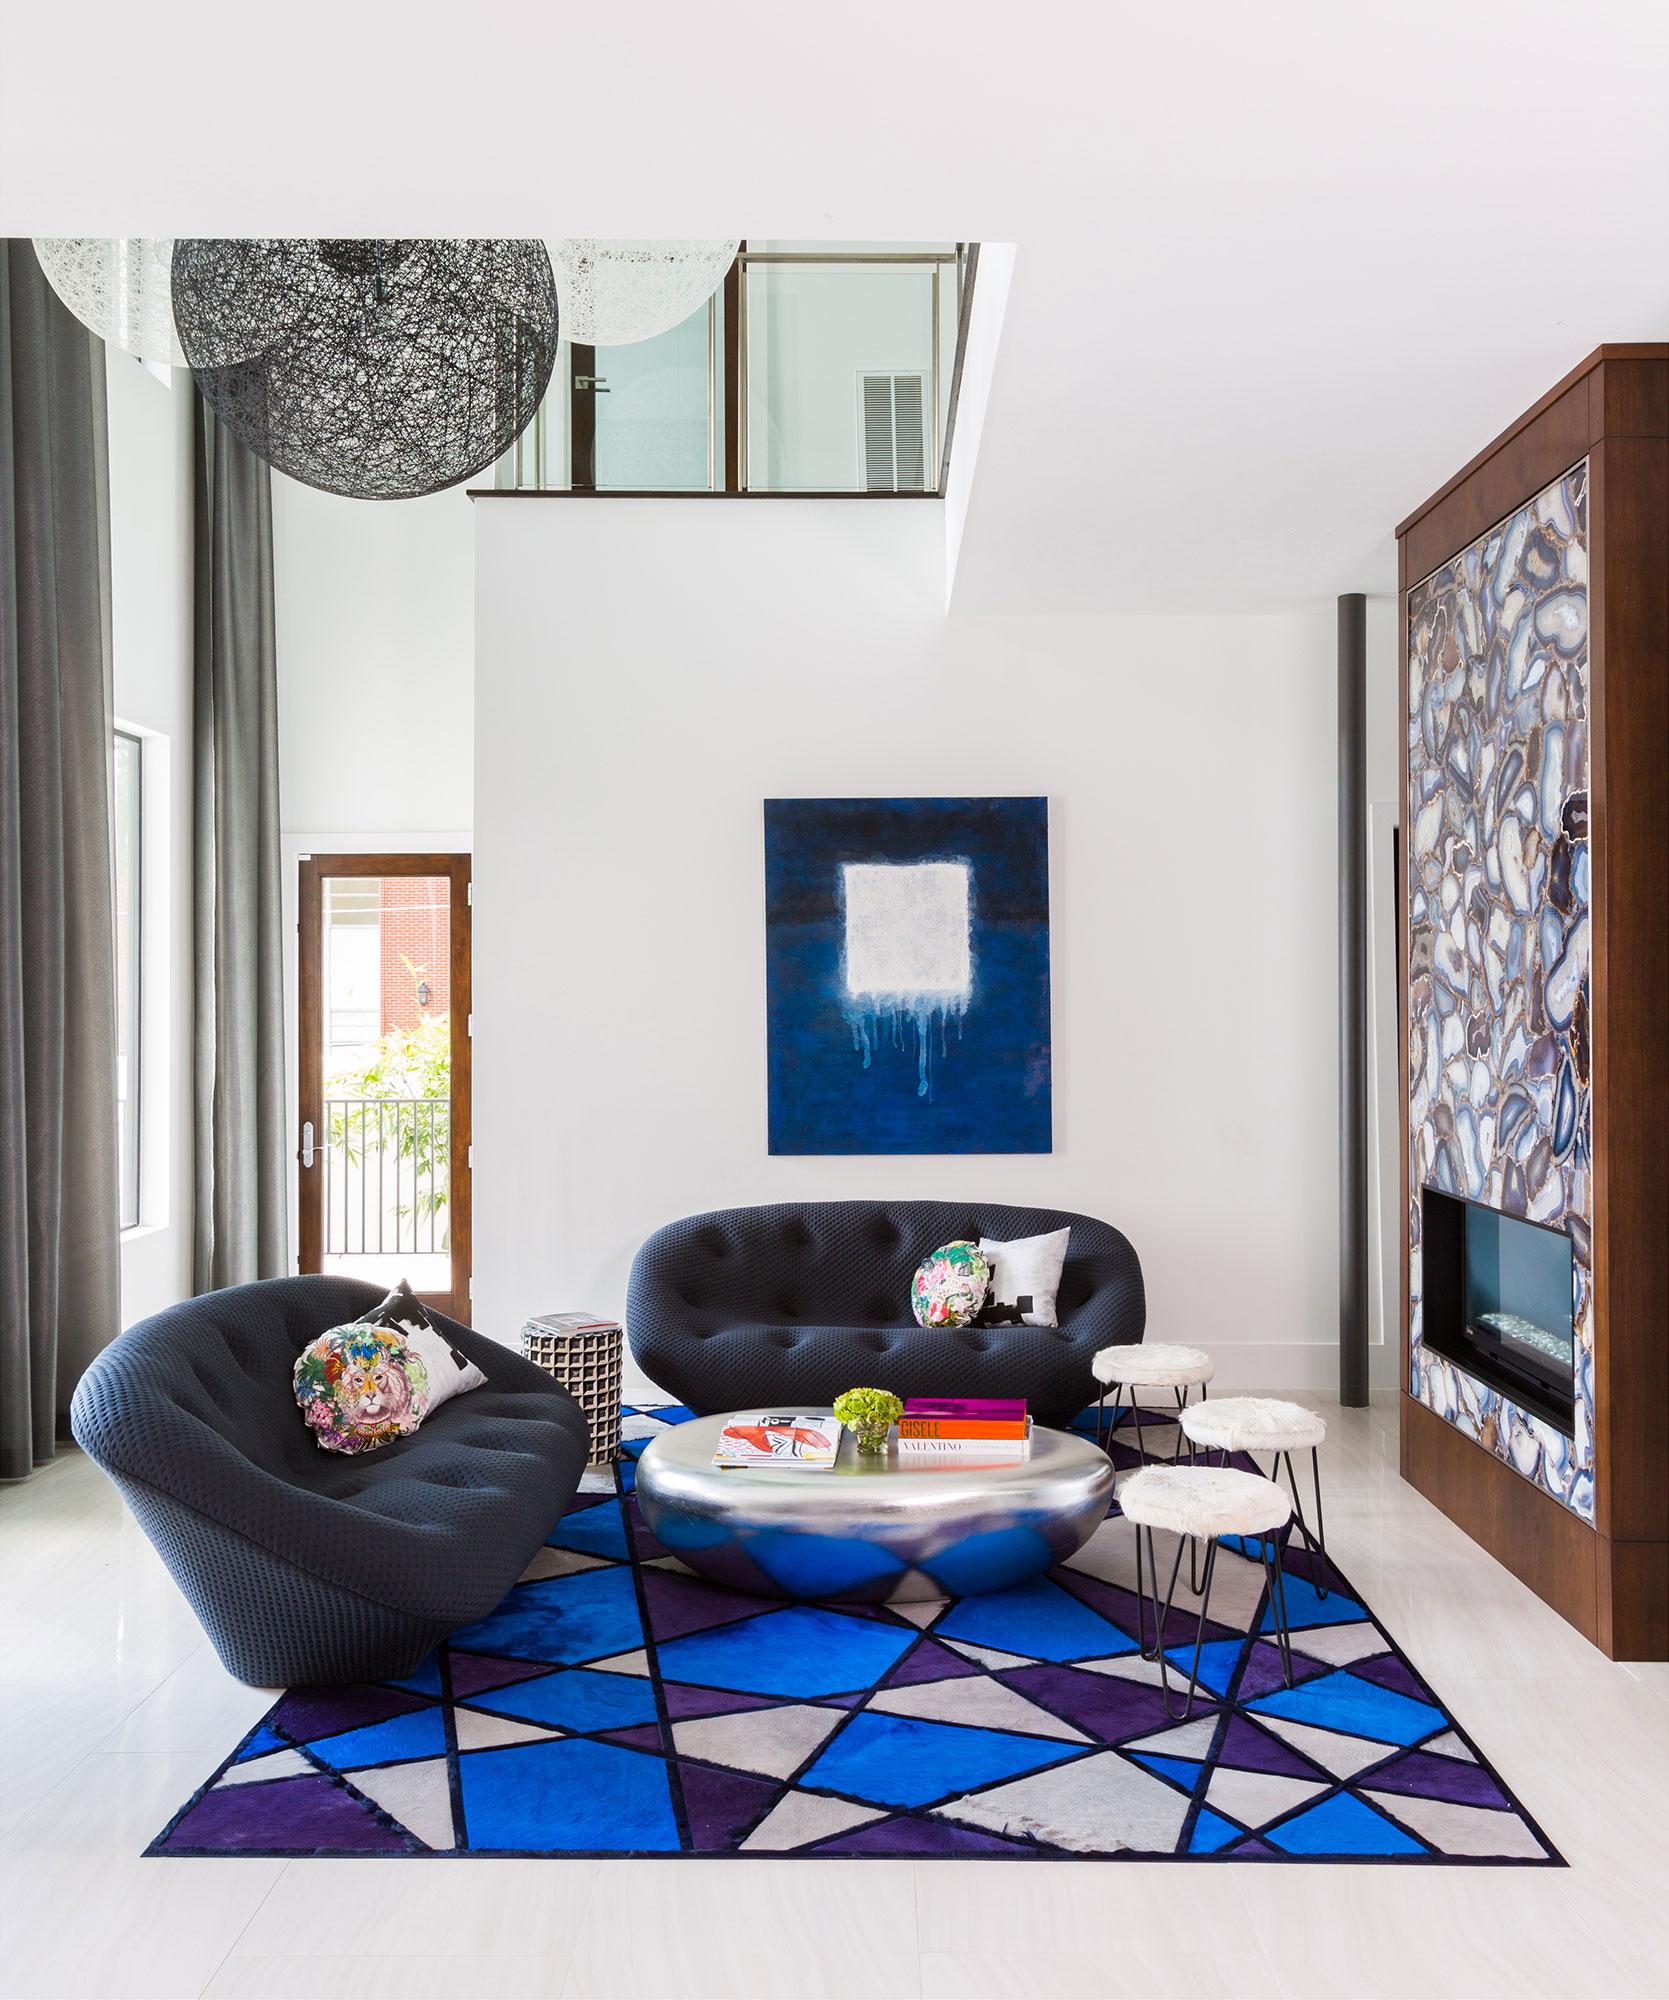 Livingroom Interiors Photography - Julie Soefer Photography